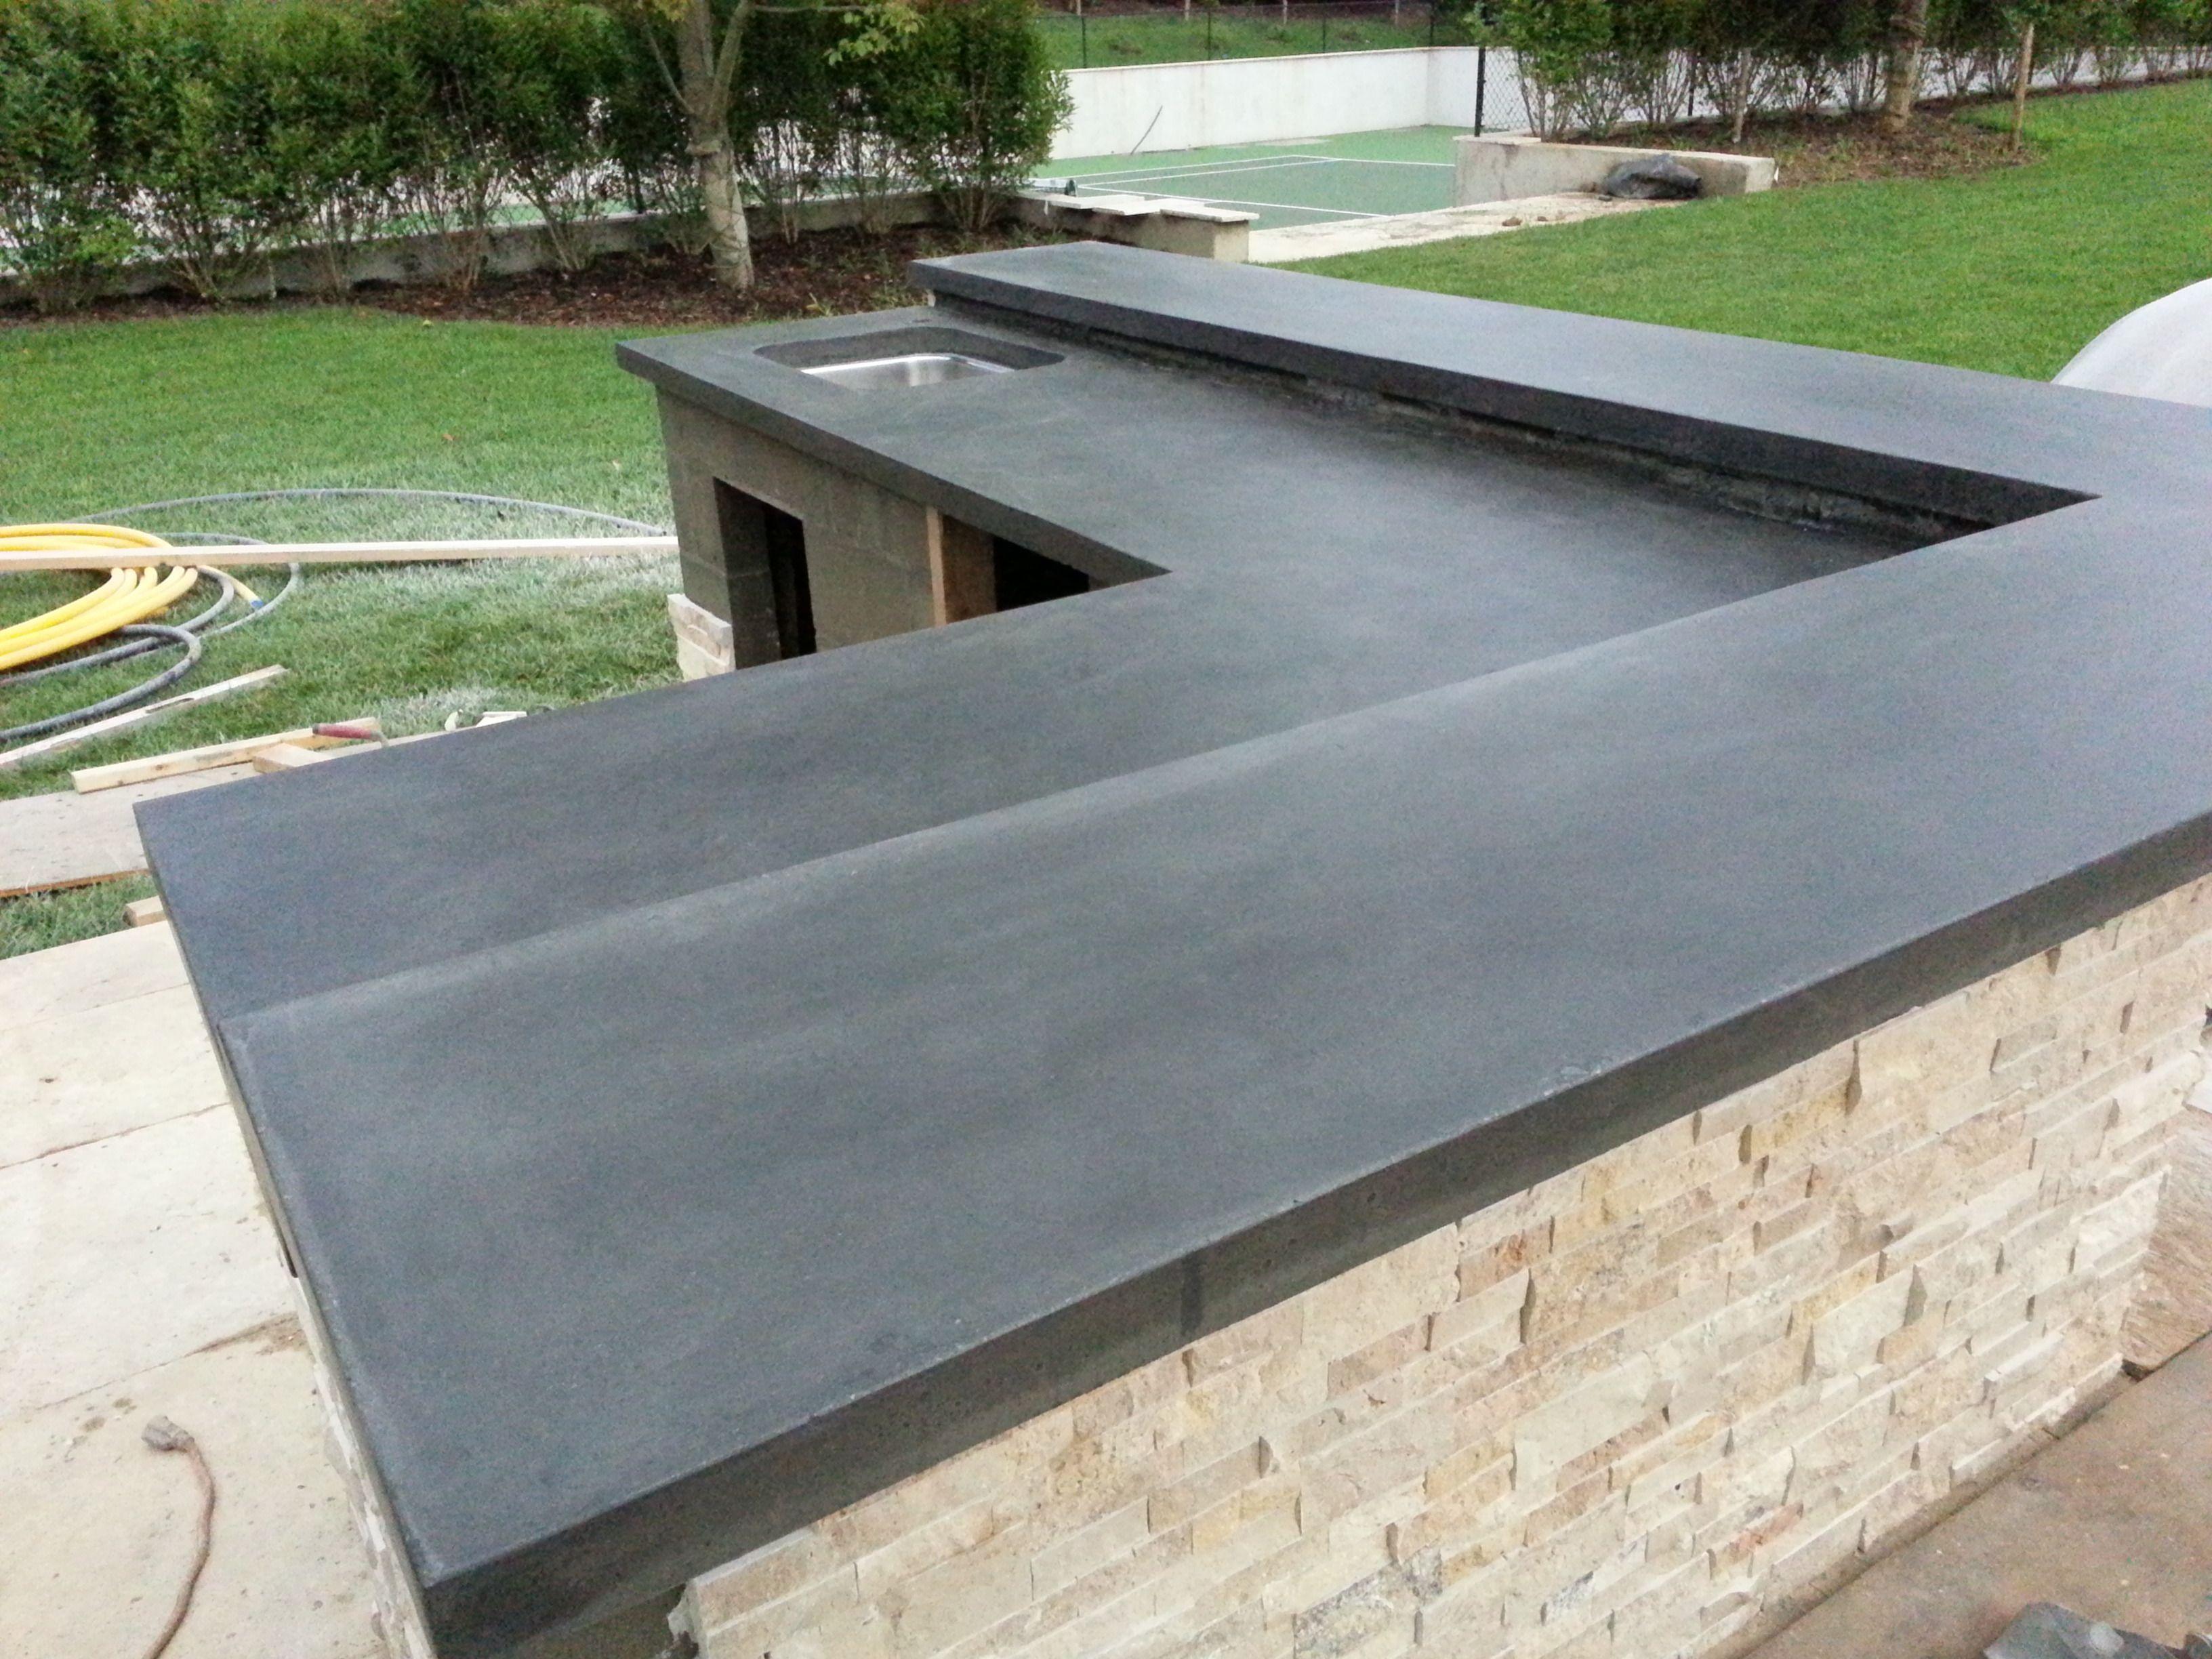 outdoor concrete counter top, black stainz | Yard Ideas ...